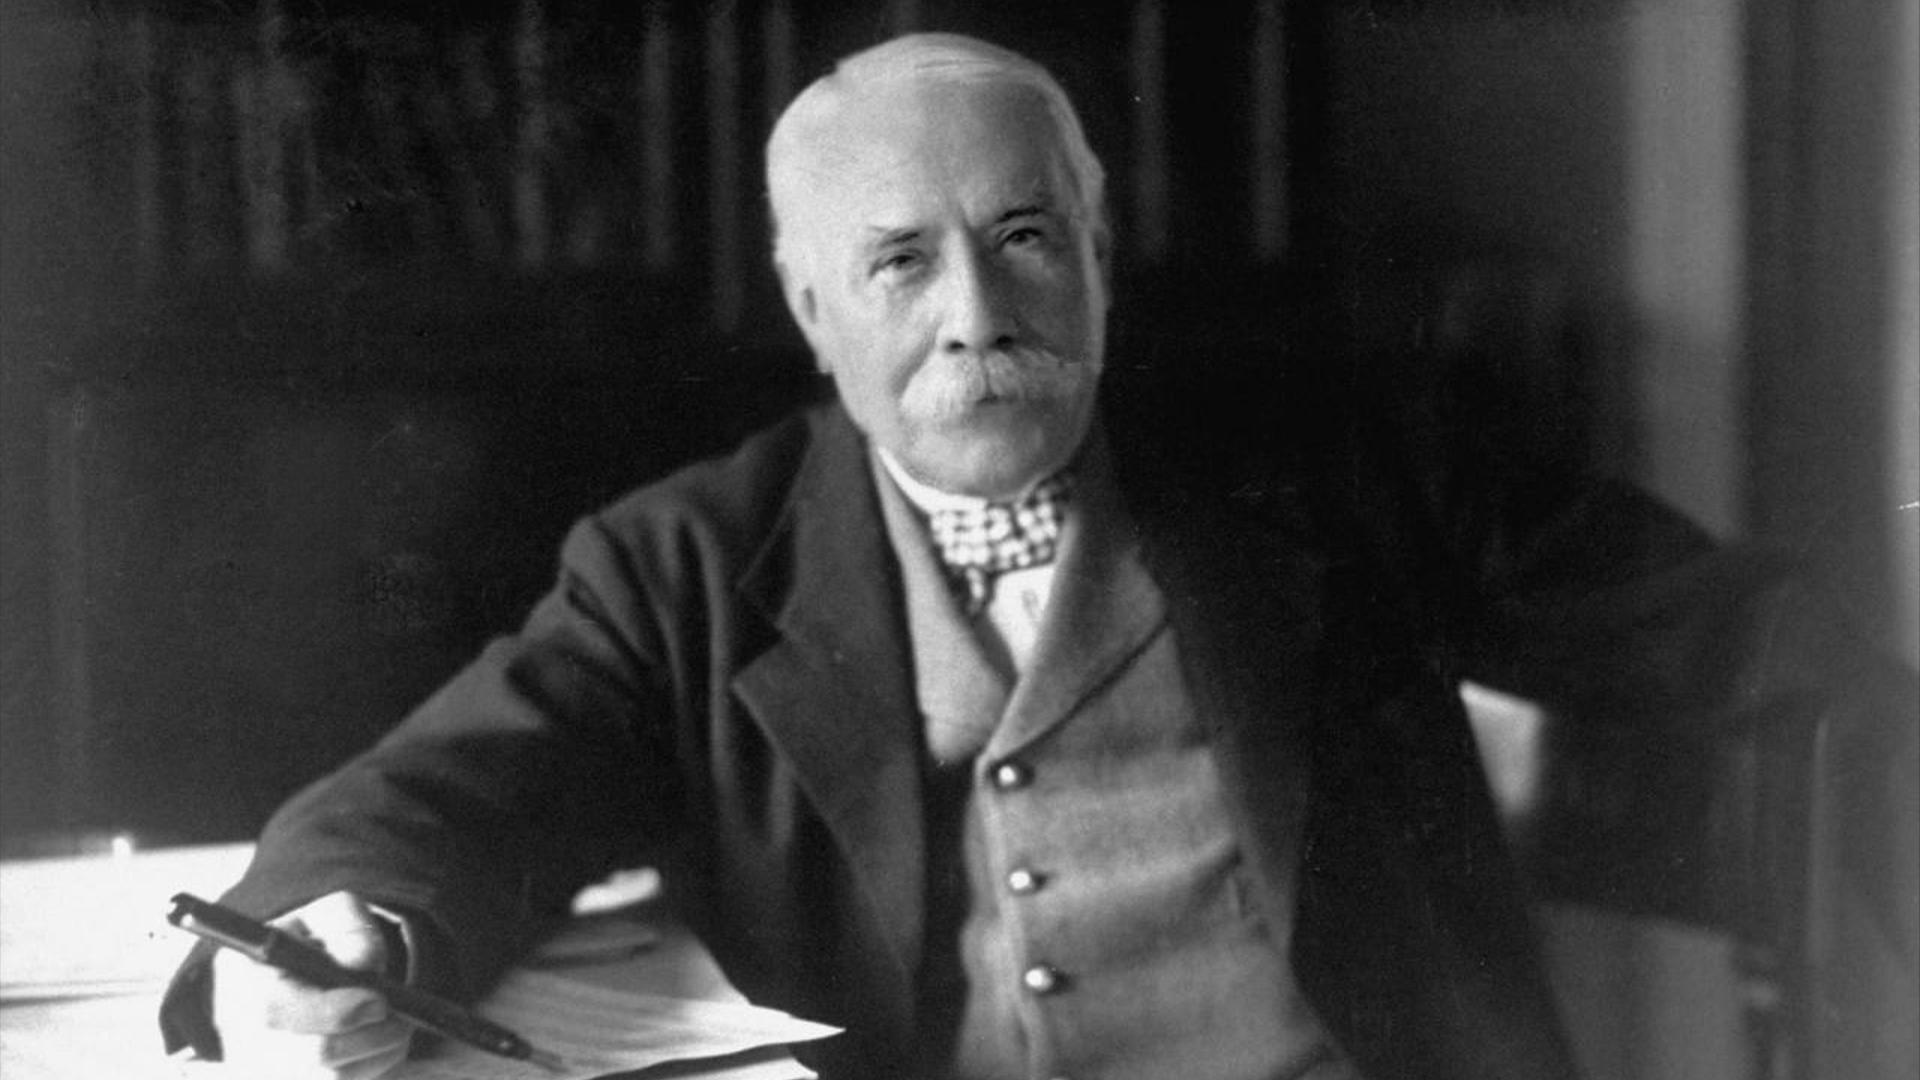 Edward Elgar, composer